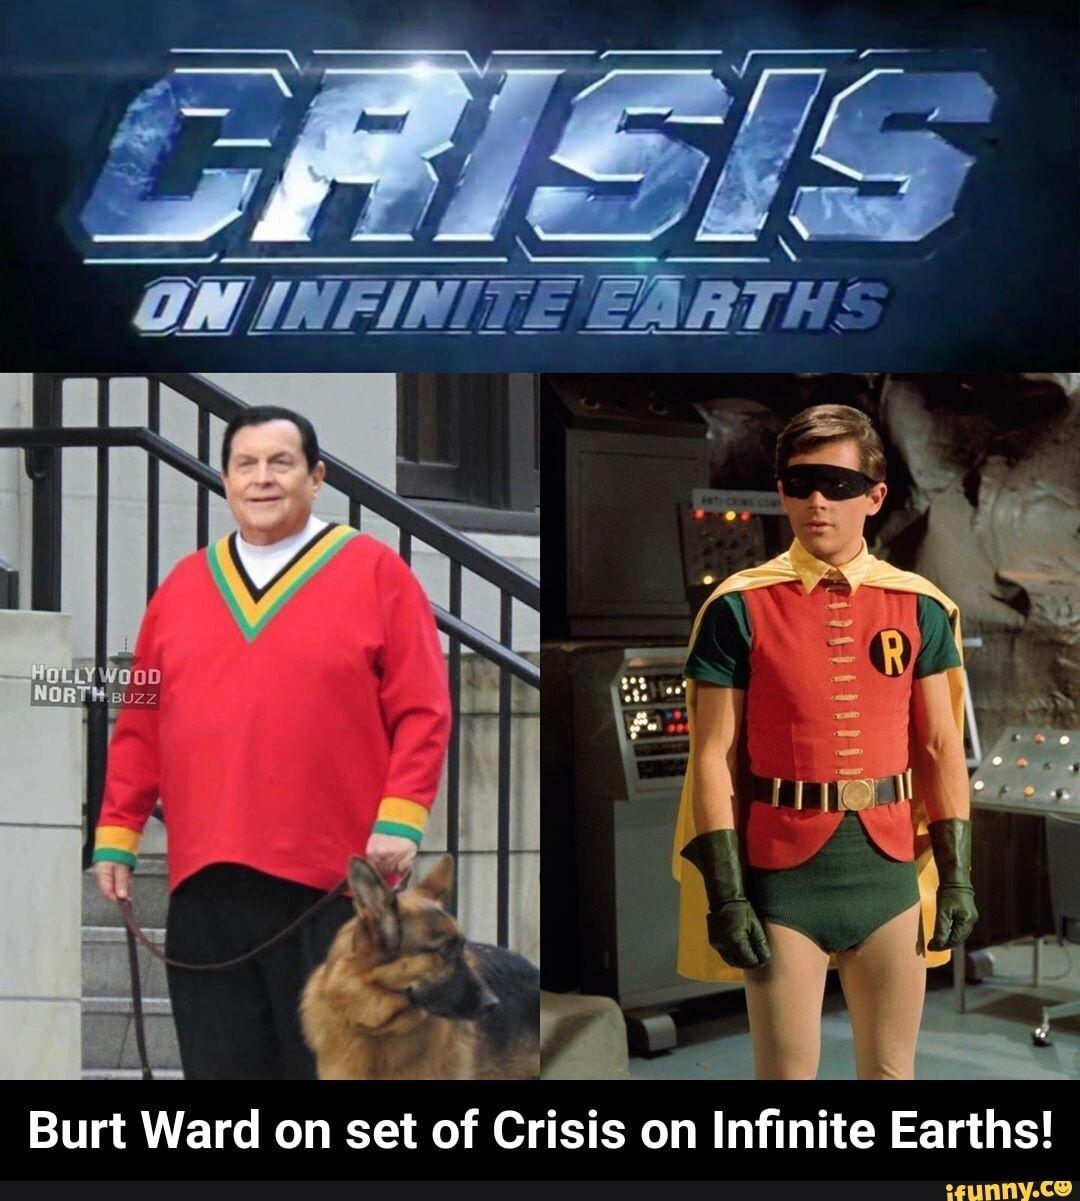 burt ward crisis on infinite earths